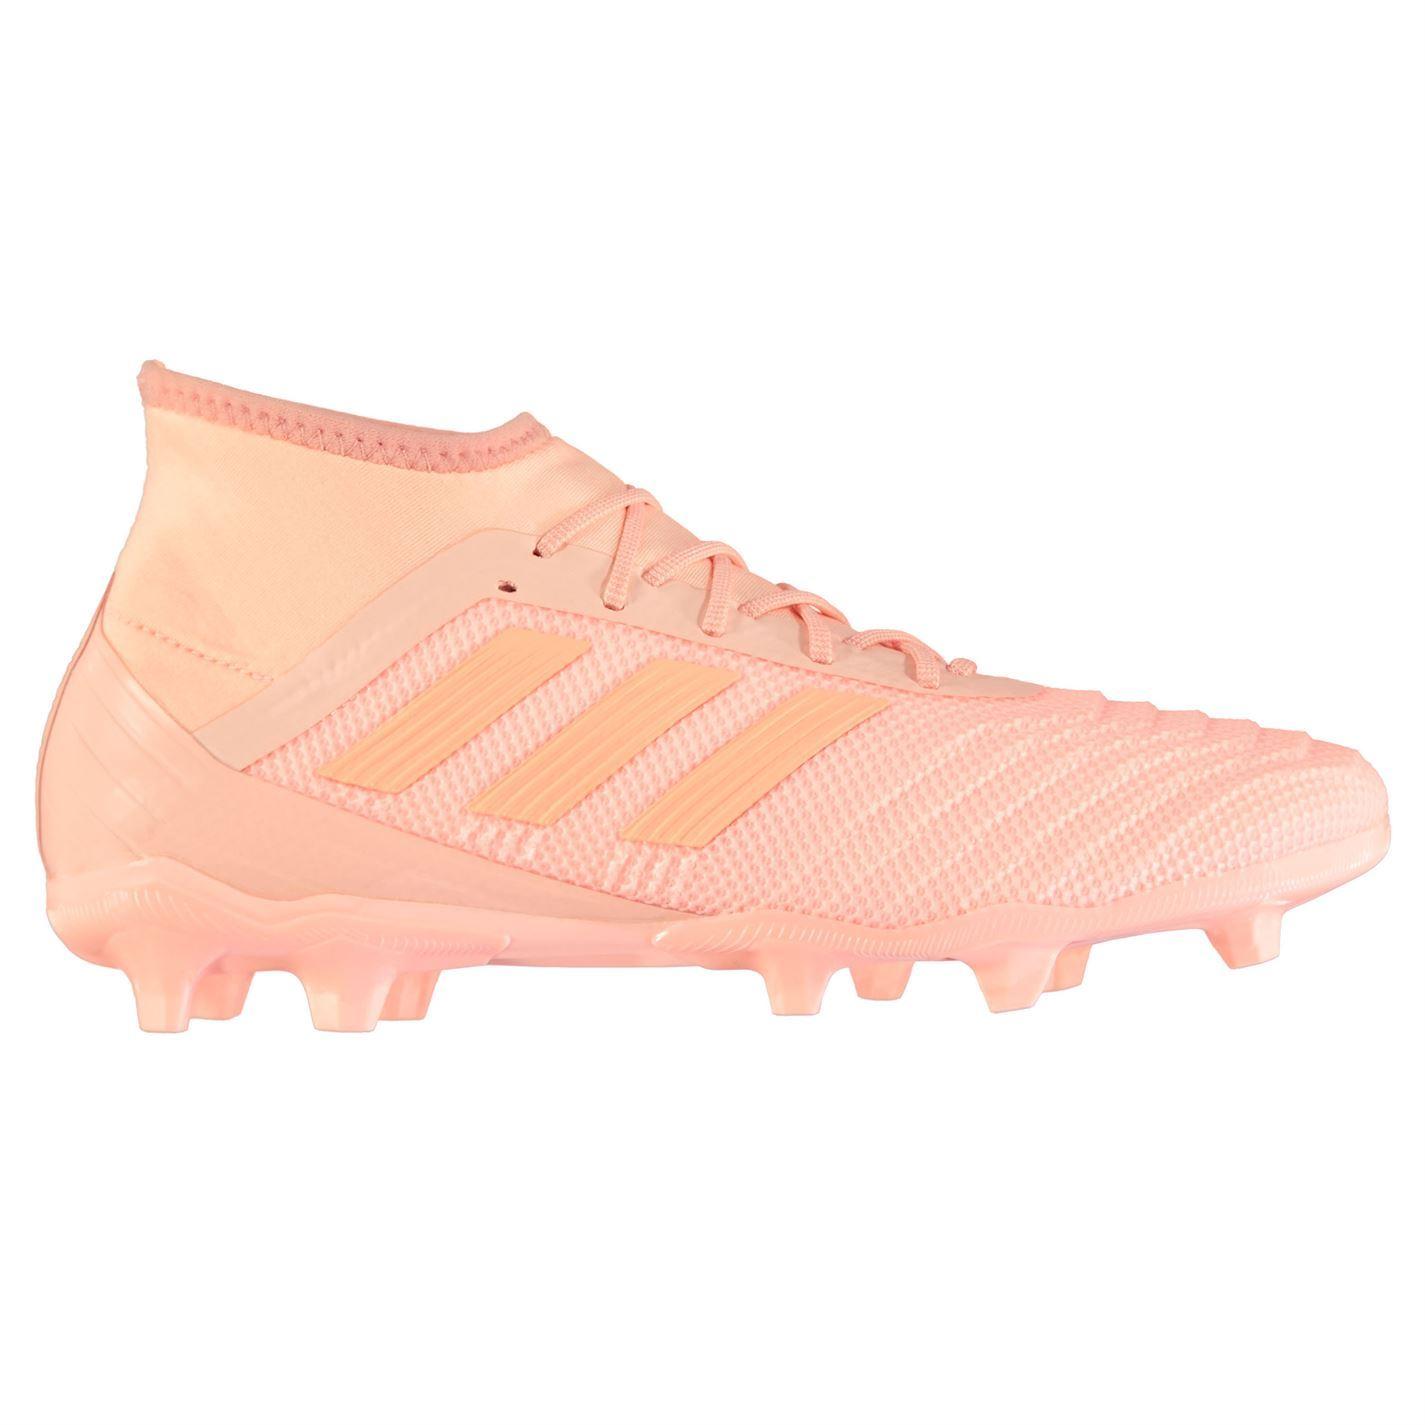 Adidas-Predator-18-2-FG-Firm-Ground-Chaussures-De-Football-Homme-Football-Chaussures-Crampons miniature 12